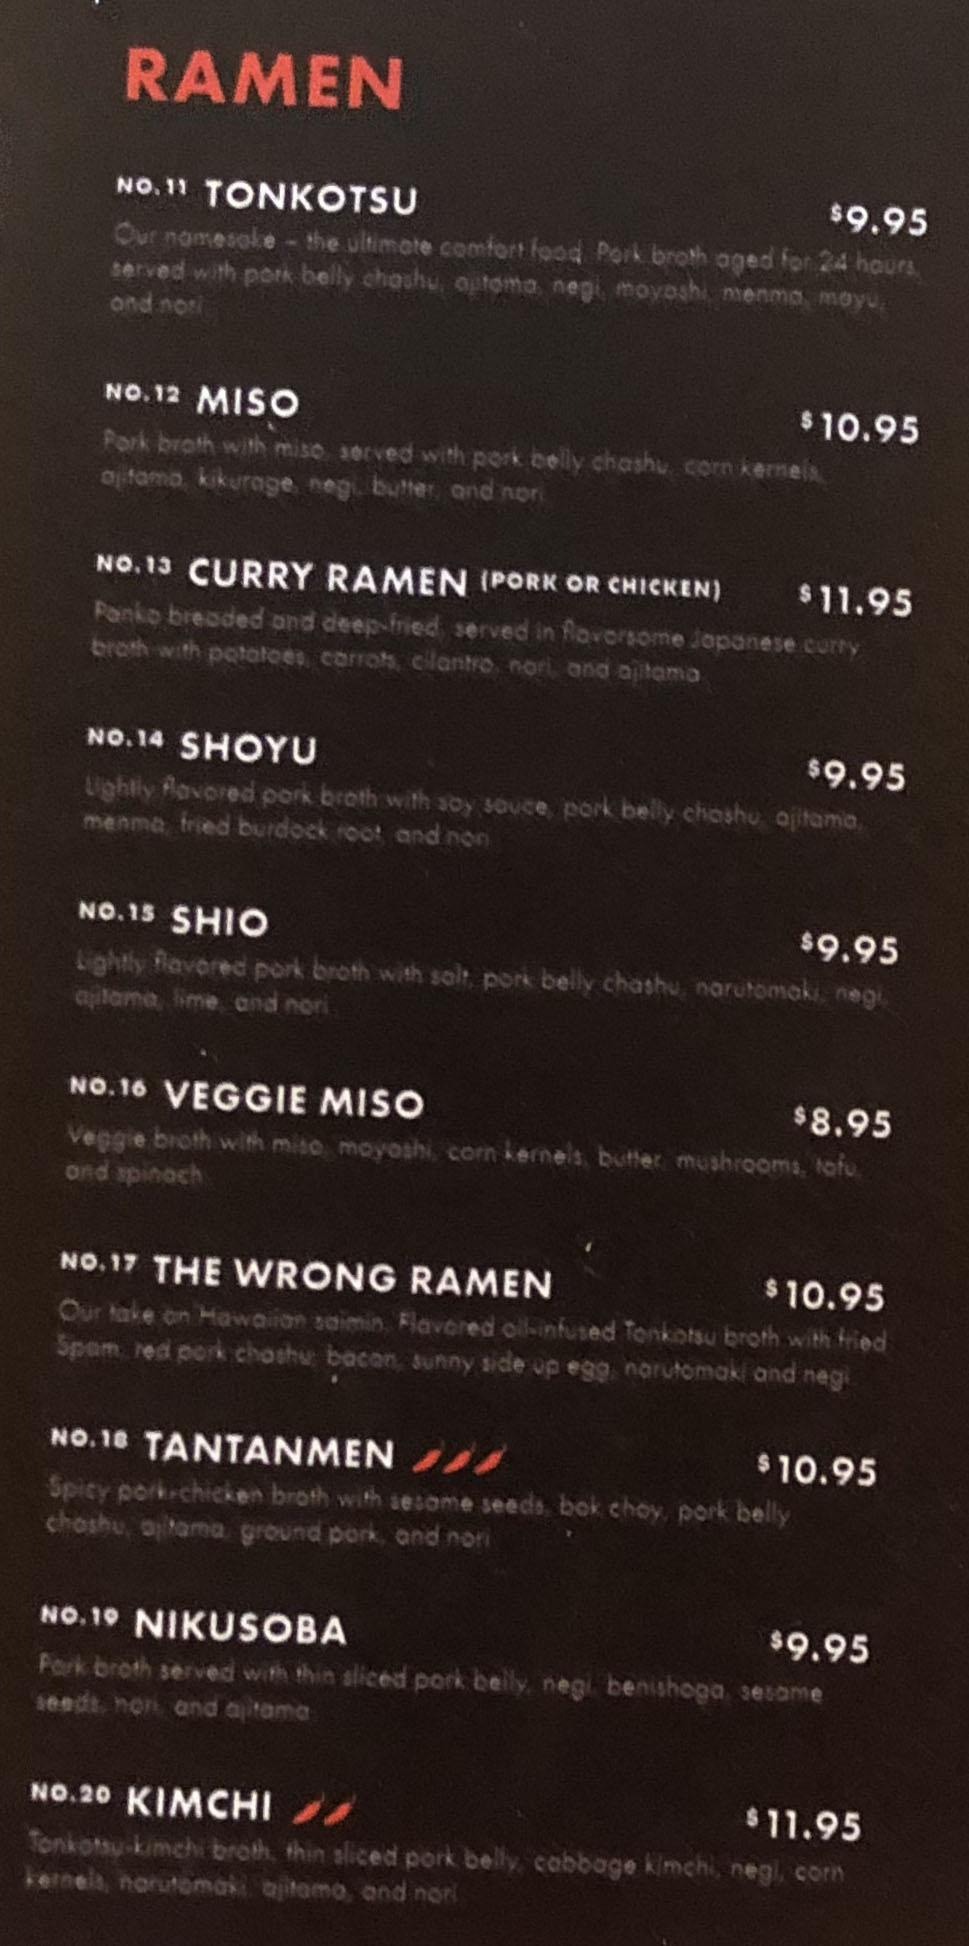 Tonkotsu Ramen Bar menu - ramen